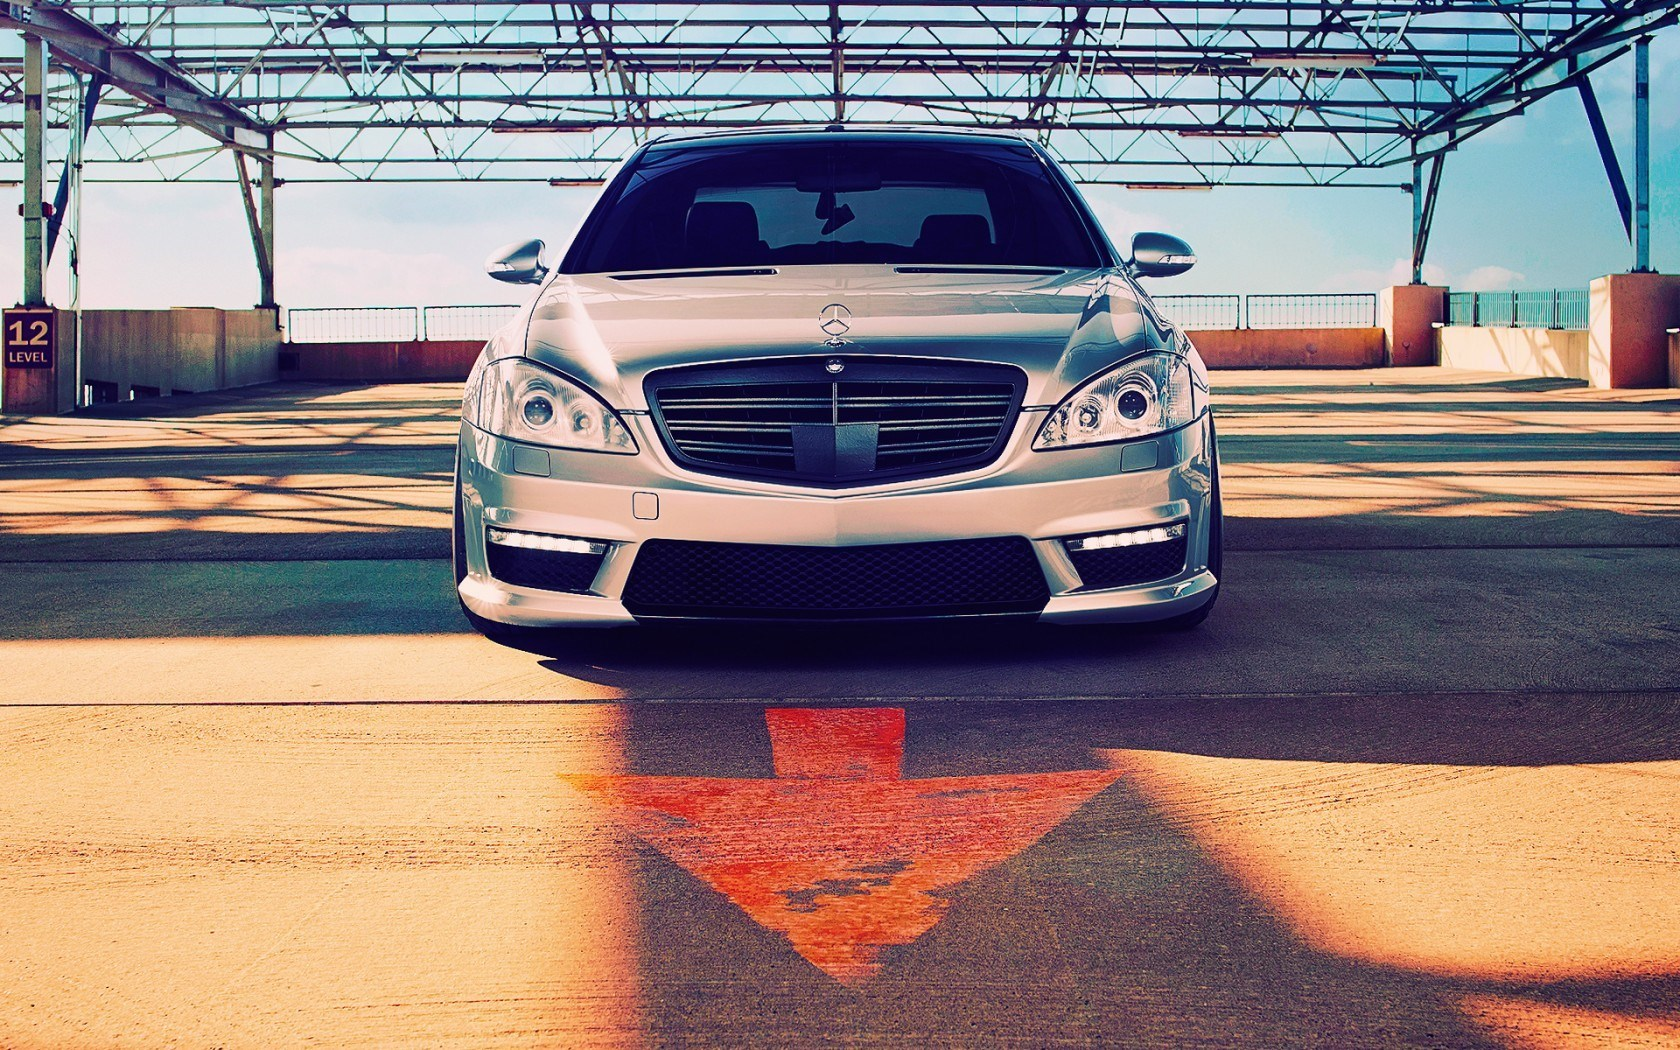 Mercedes-Benz S550 Parking